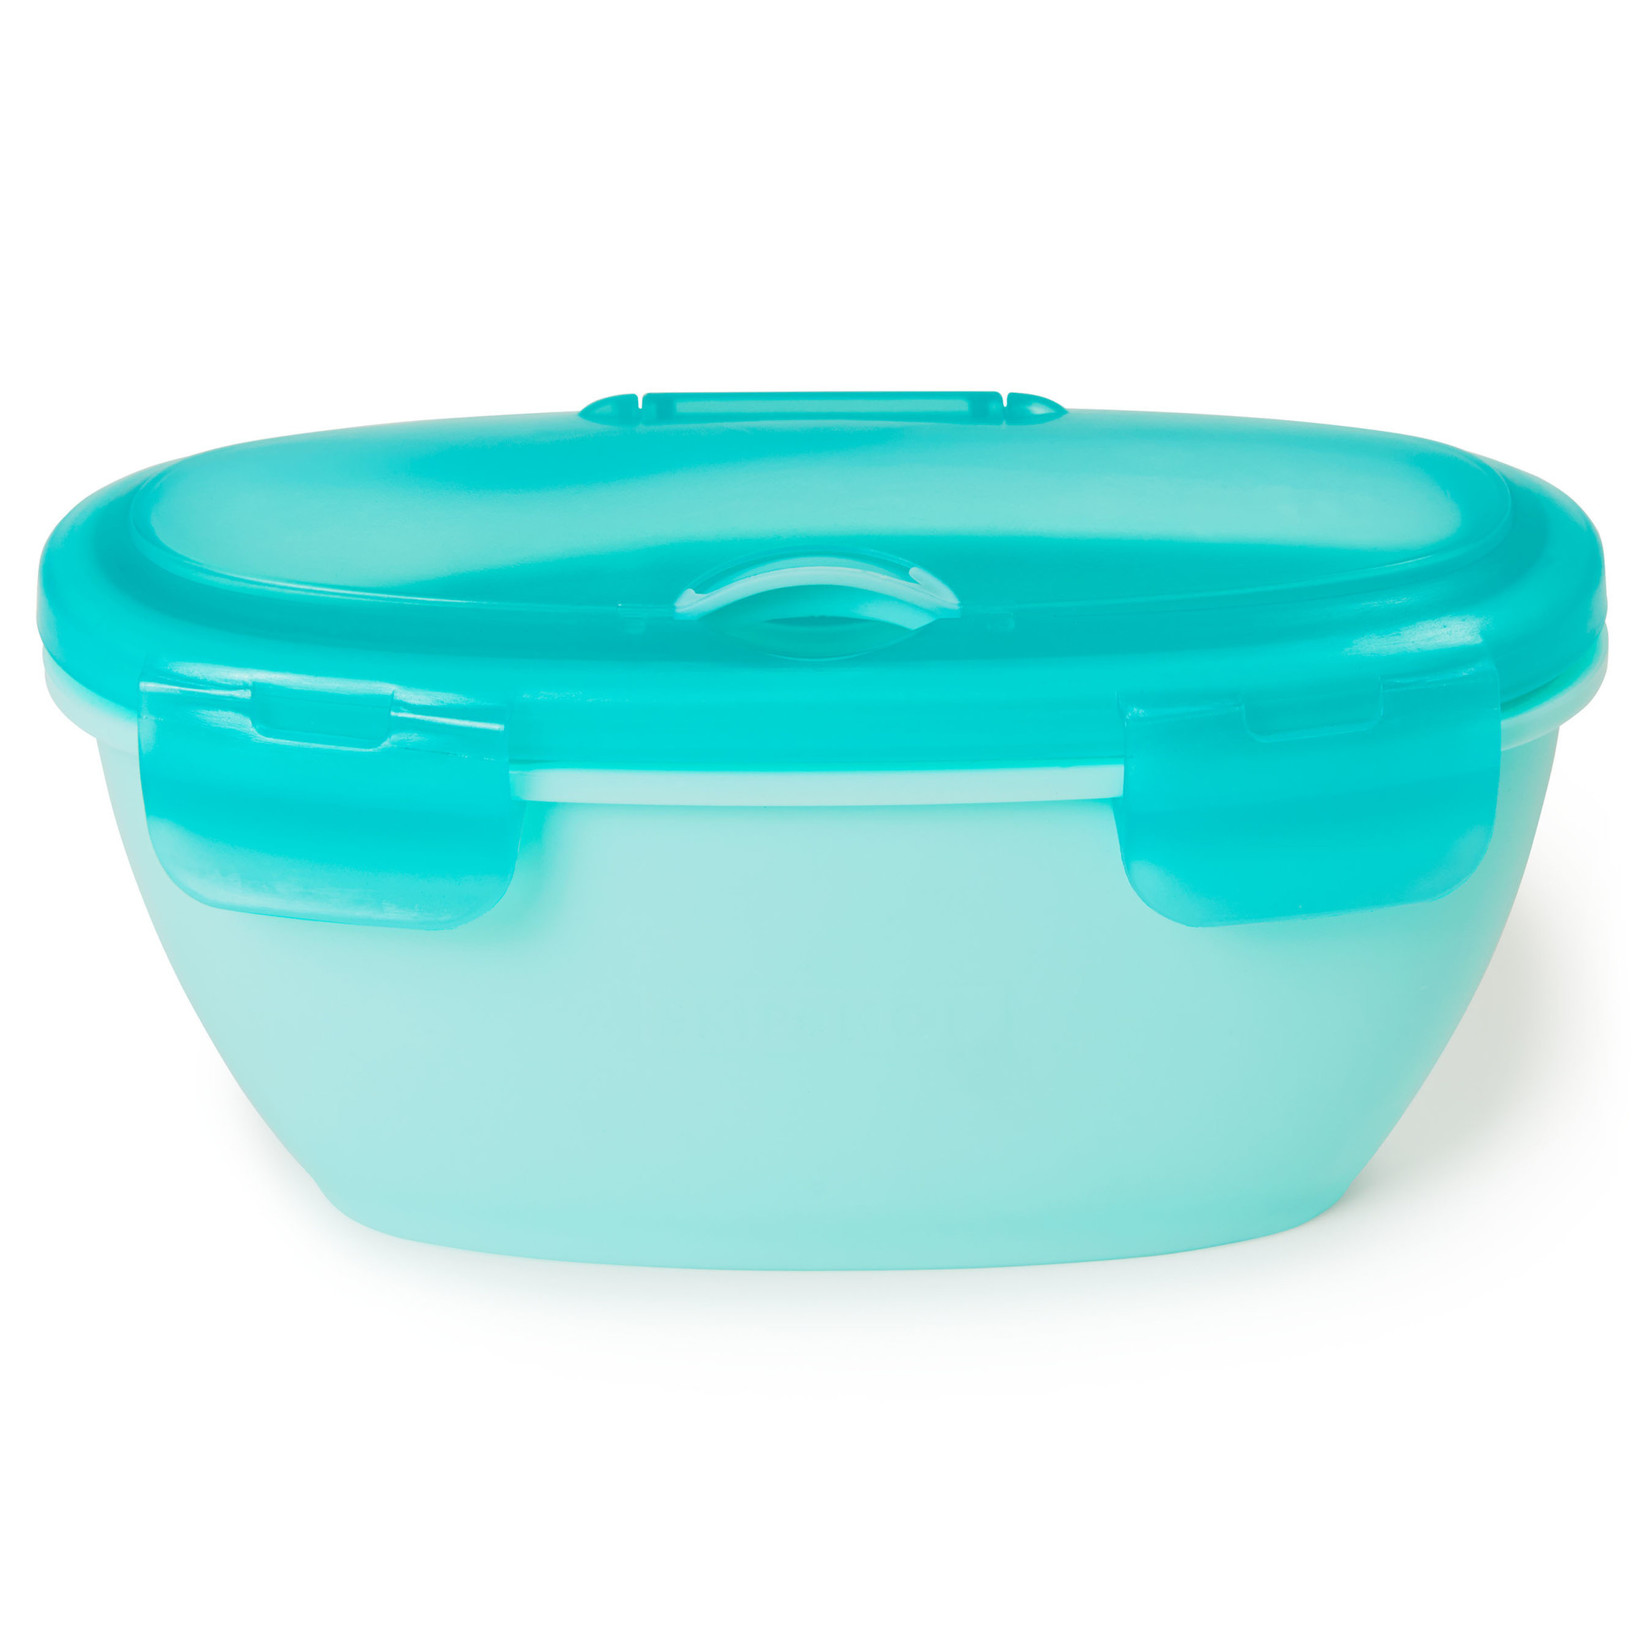 SKIP HOP Easy-Serve Travel Bowl & Spoon- Grey/Soft Teal